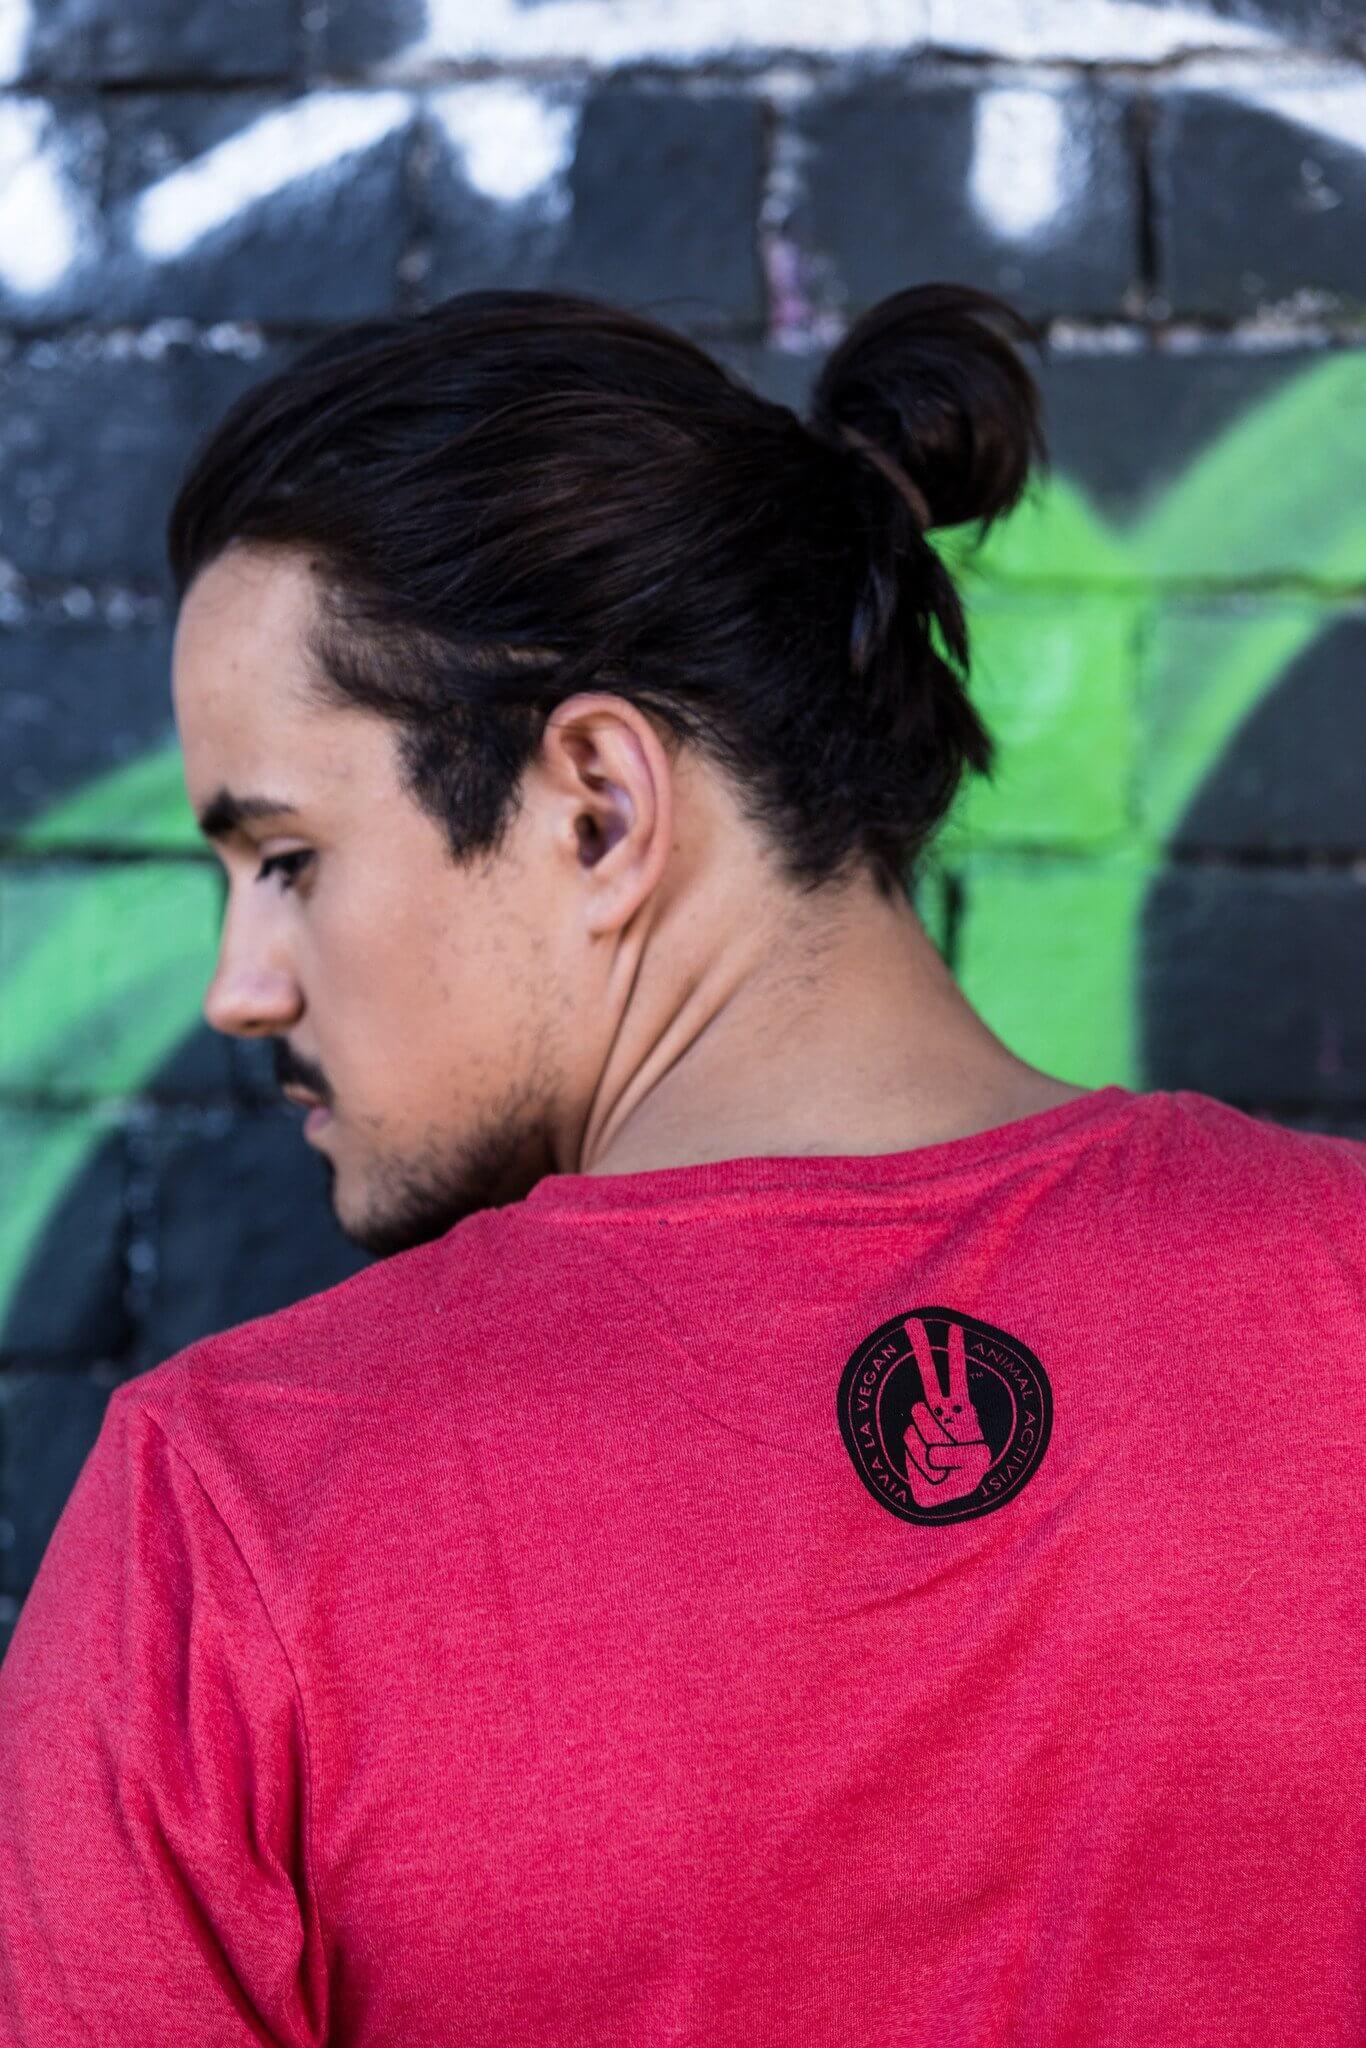 Unisex Tshirt : Zombies Eat Flesh - Go Vegan